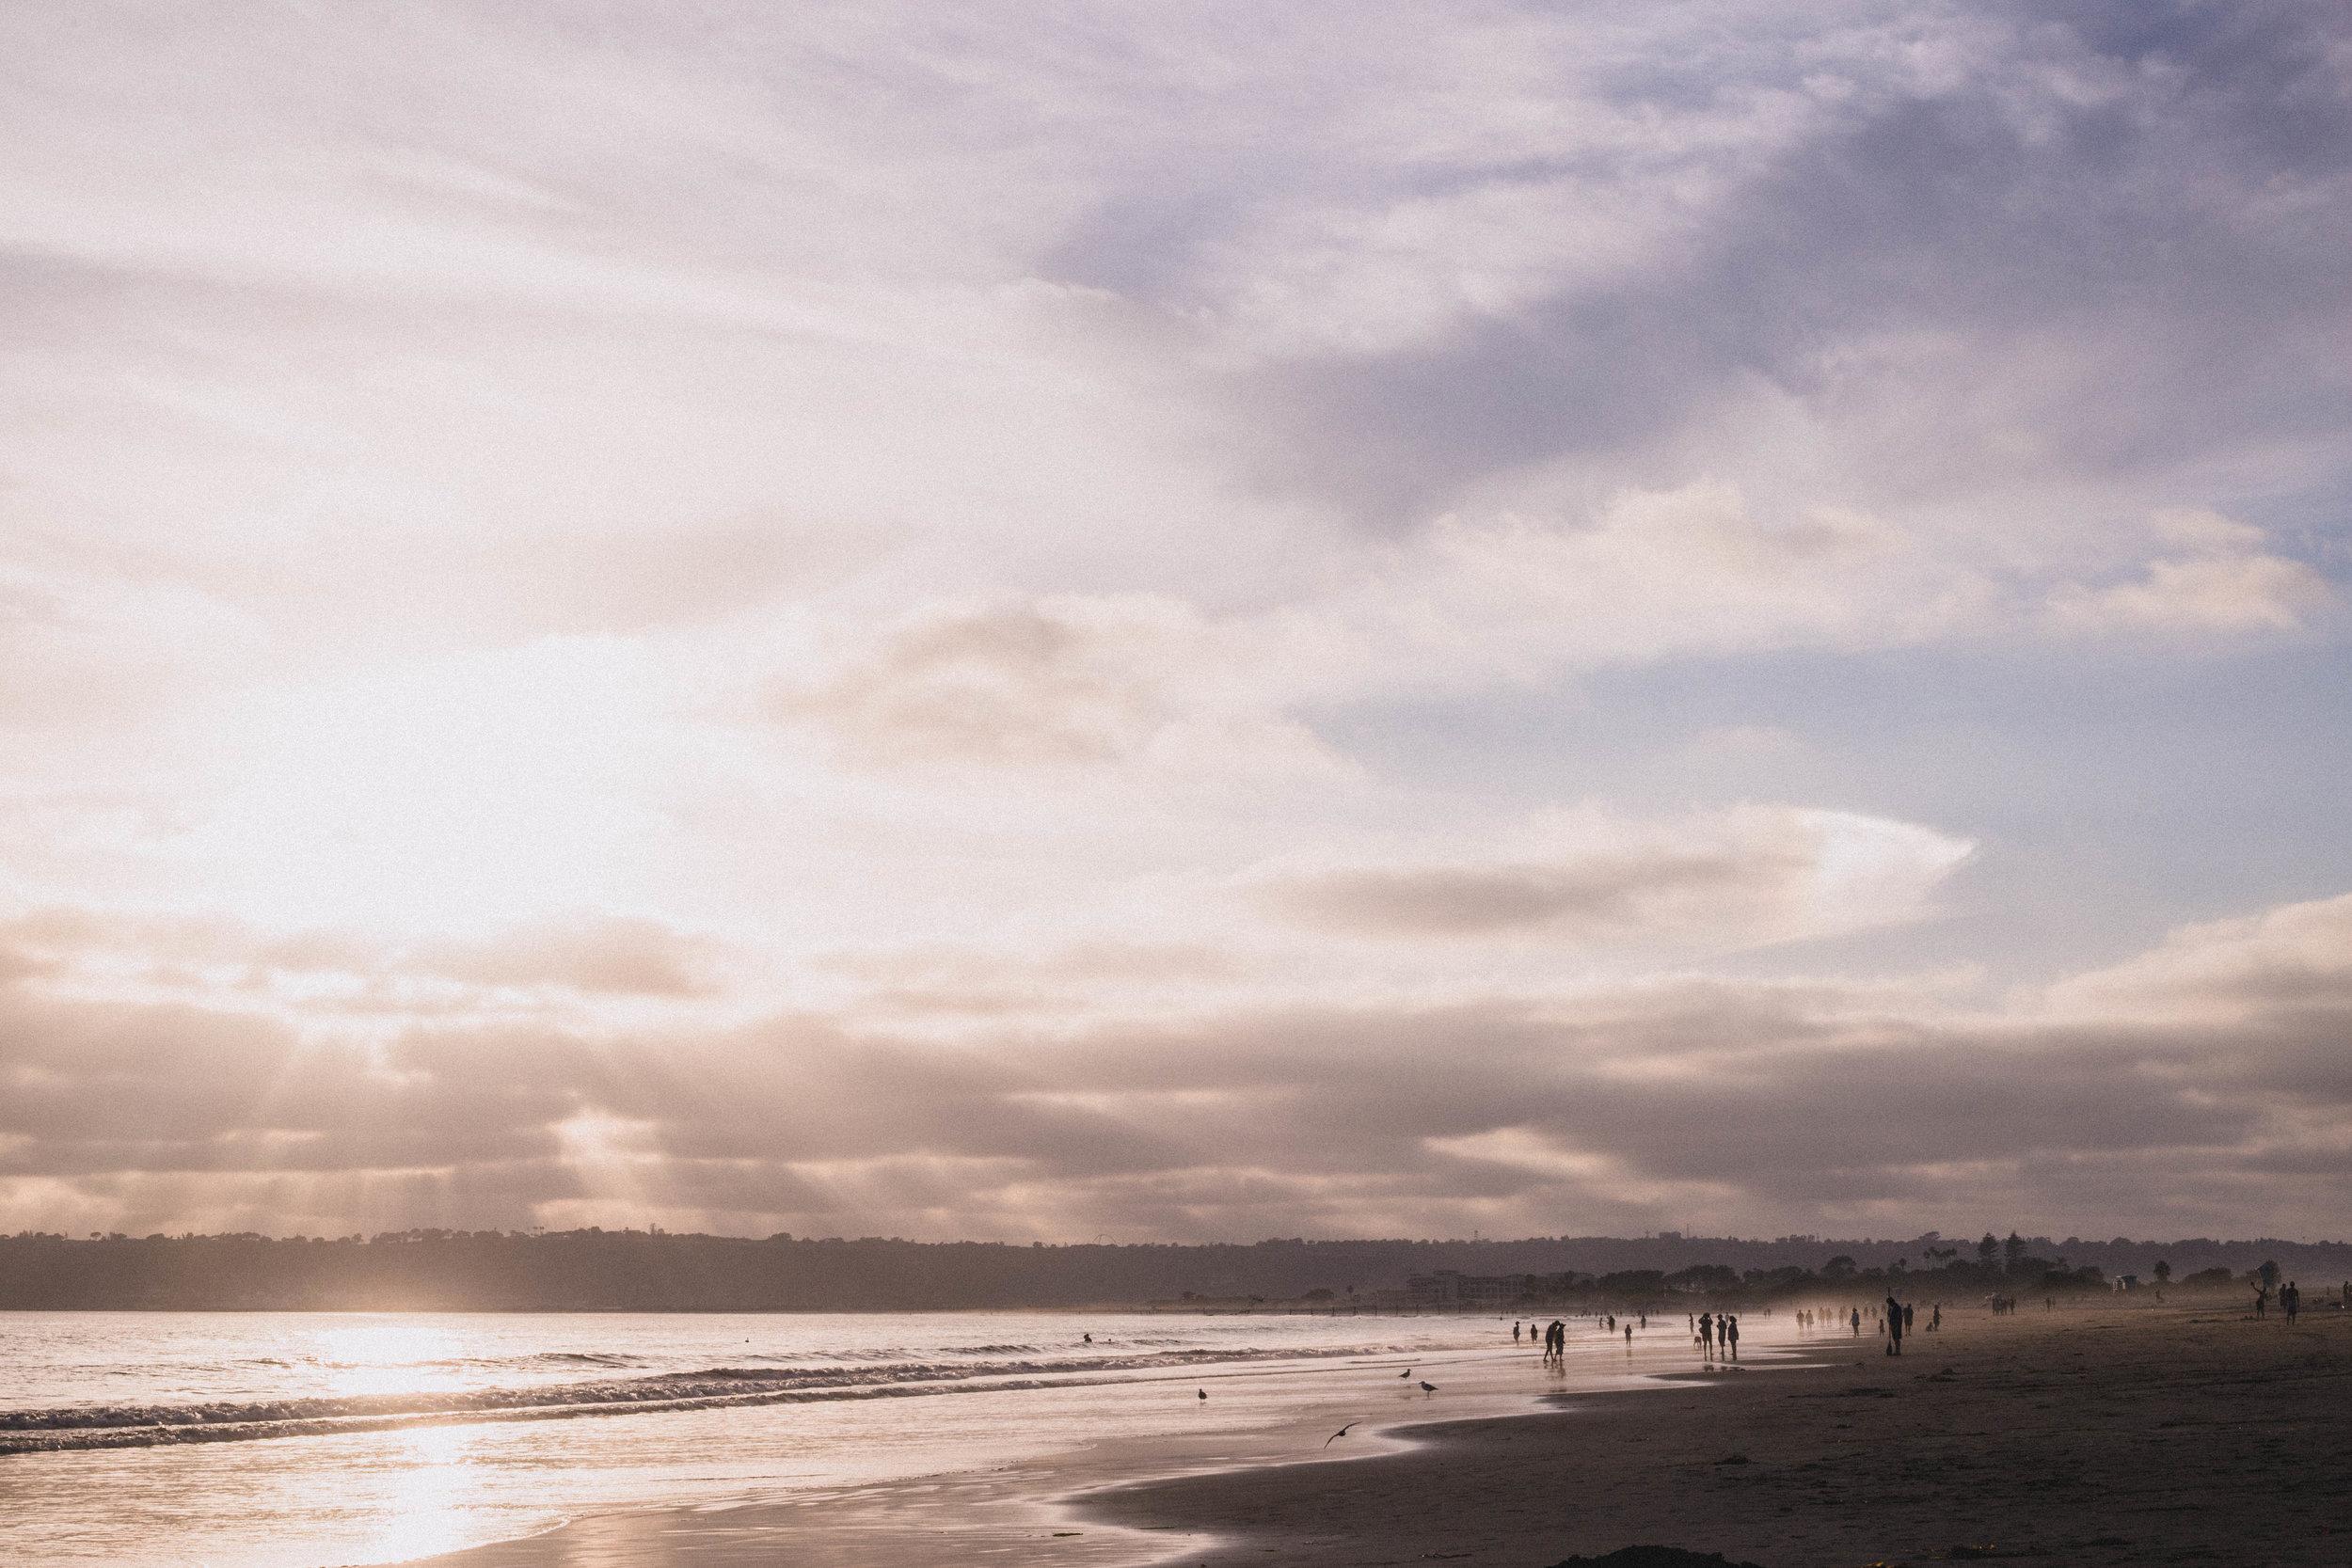 Coronado Beach at Sunset (San Diego city guide)